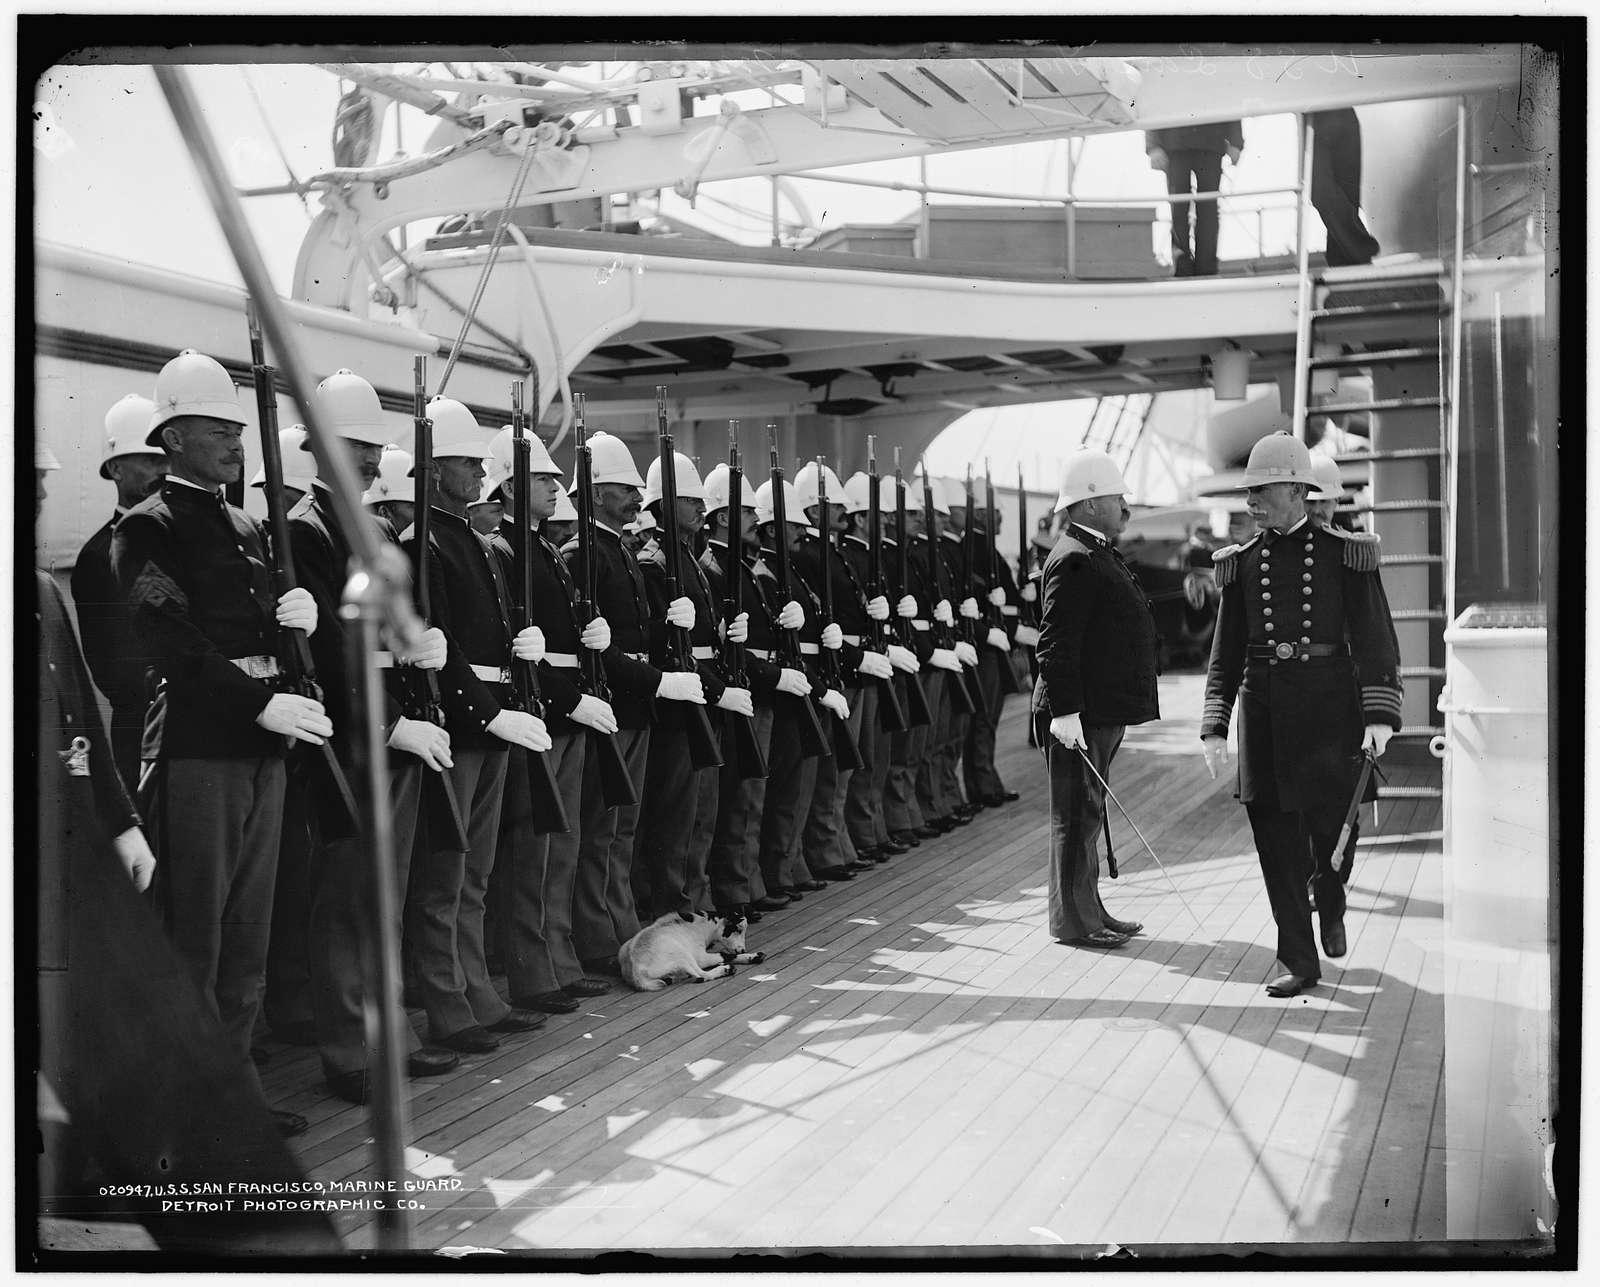 U.S.S. San Francisco, Marine guard